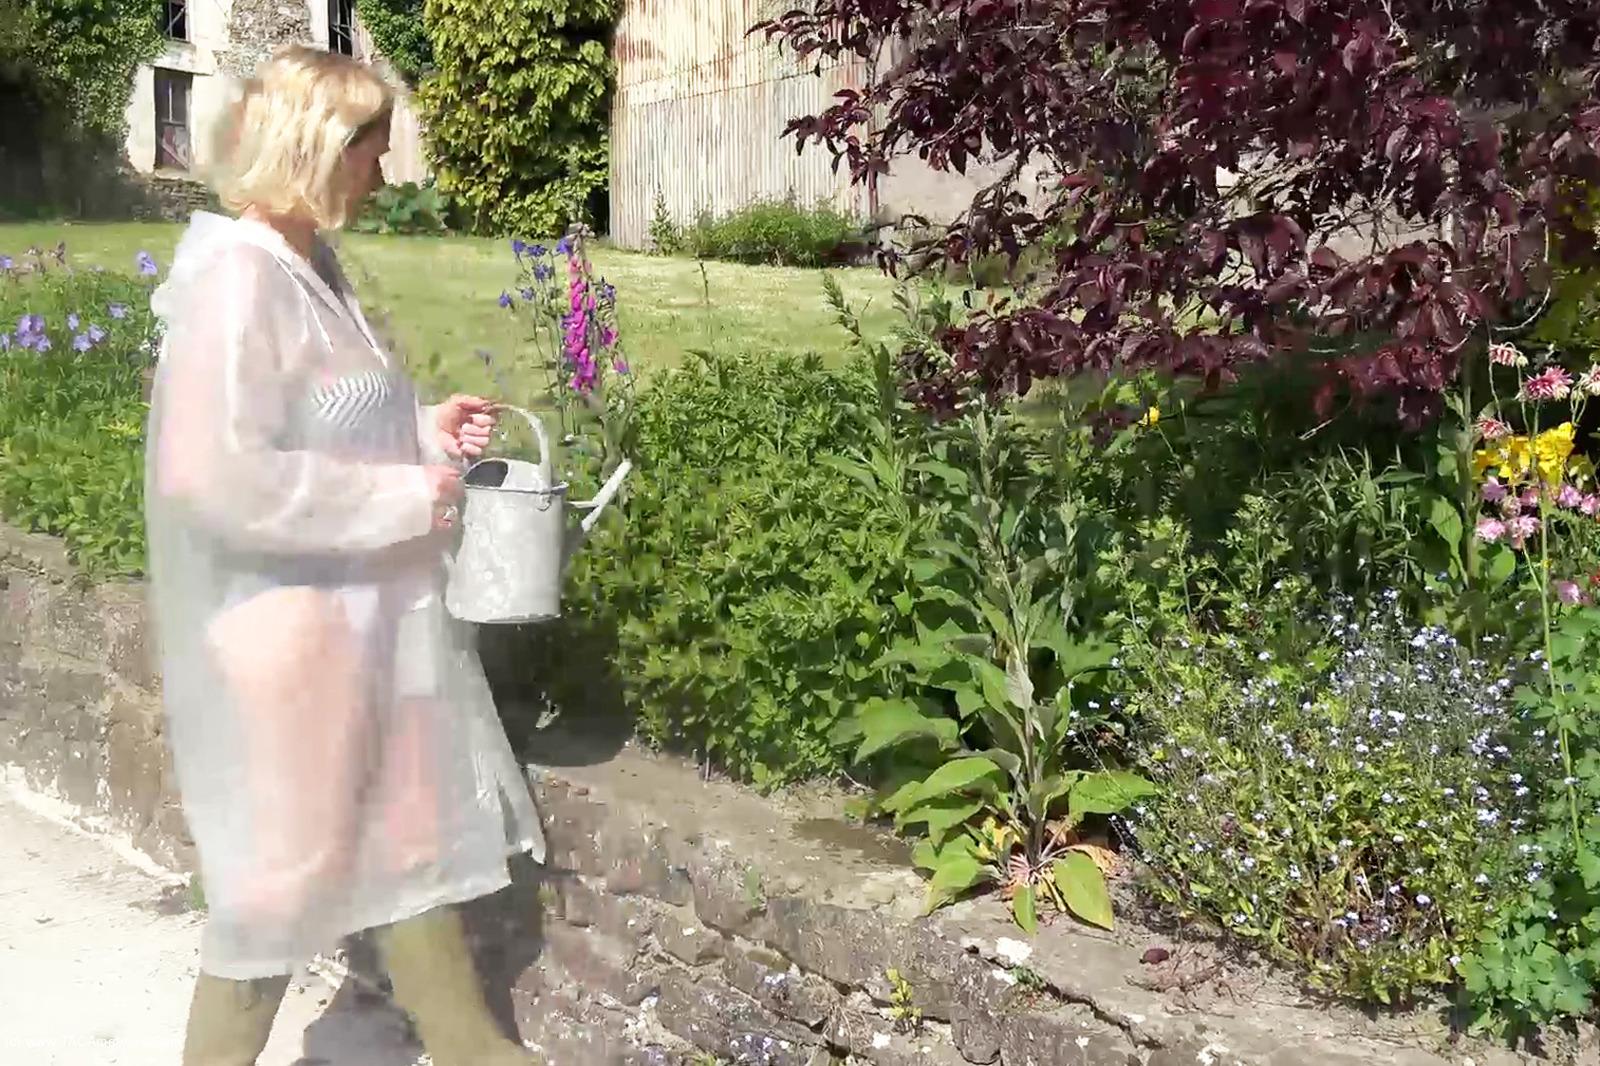 DirtyDoctor - Watering My Plants Pt1 scene 0